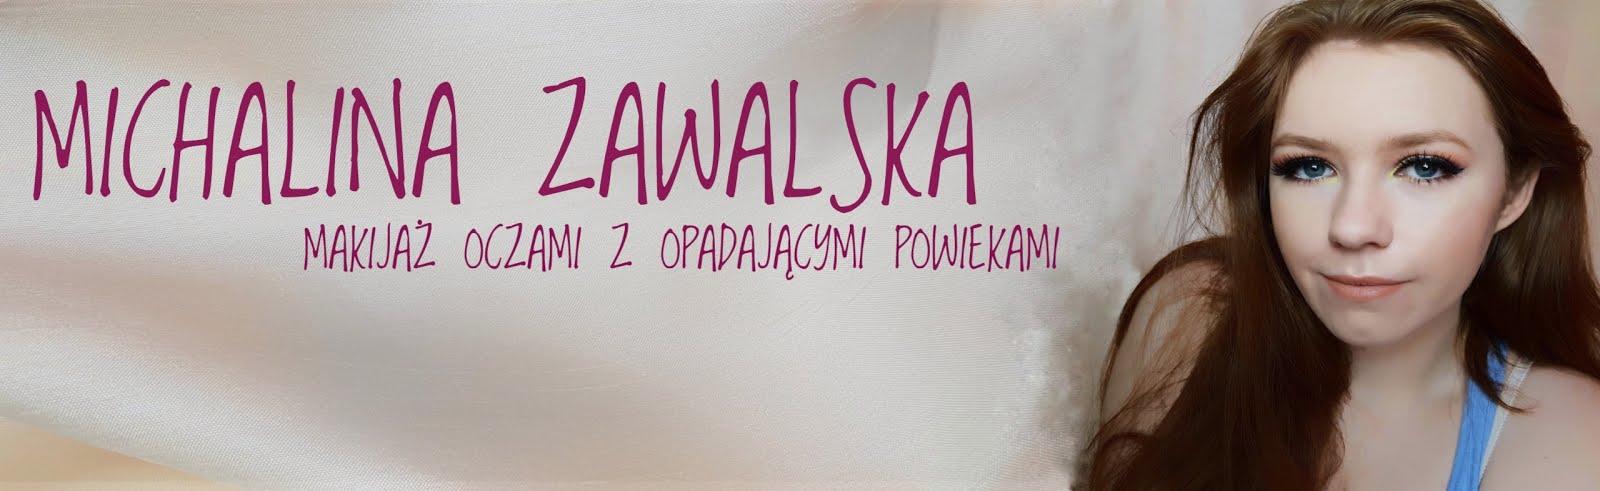 Michalina Zawalska